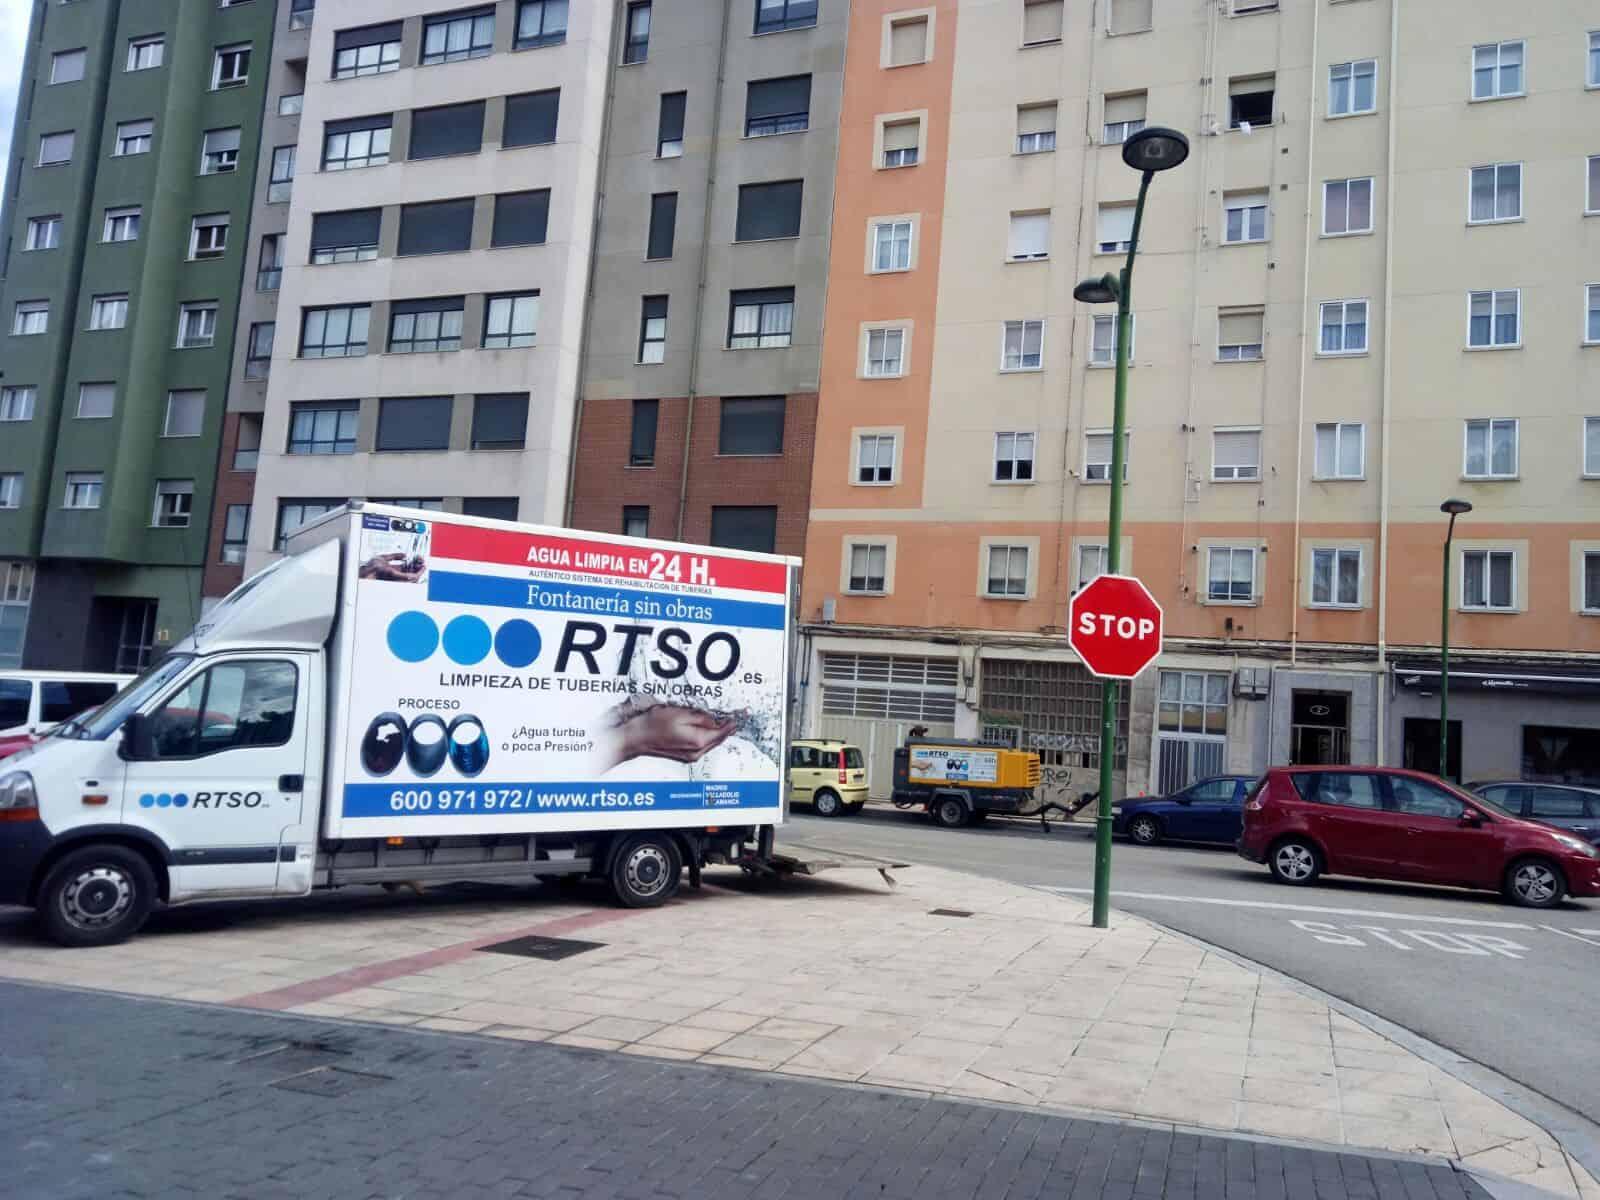 limpieza de tuberias sin obras Burgos Capital